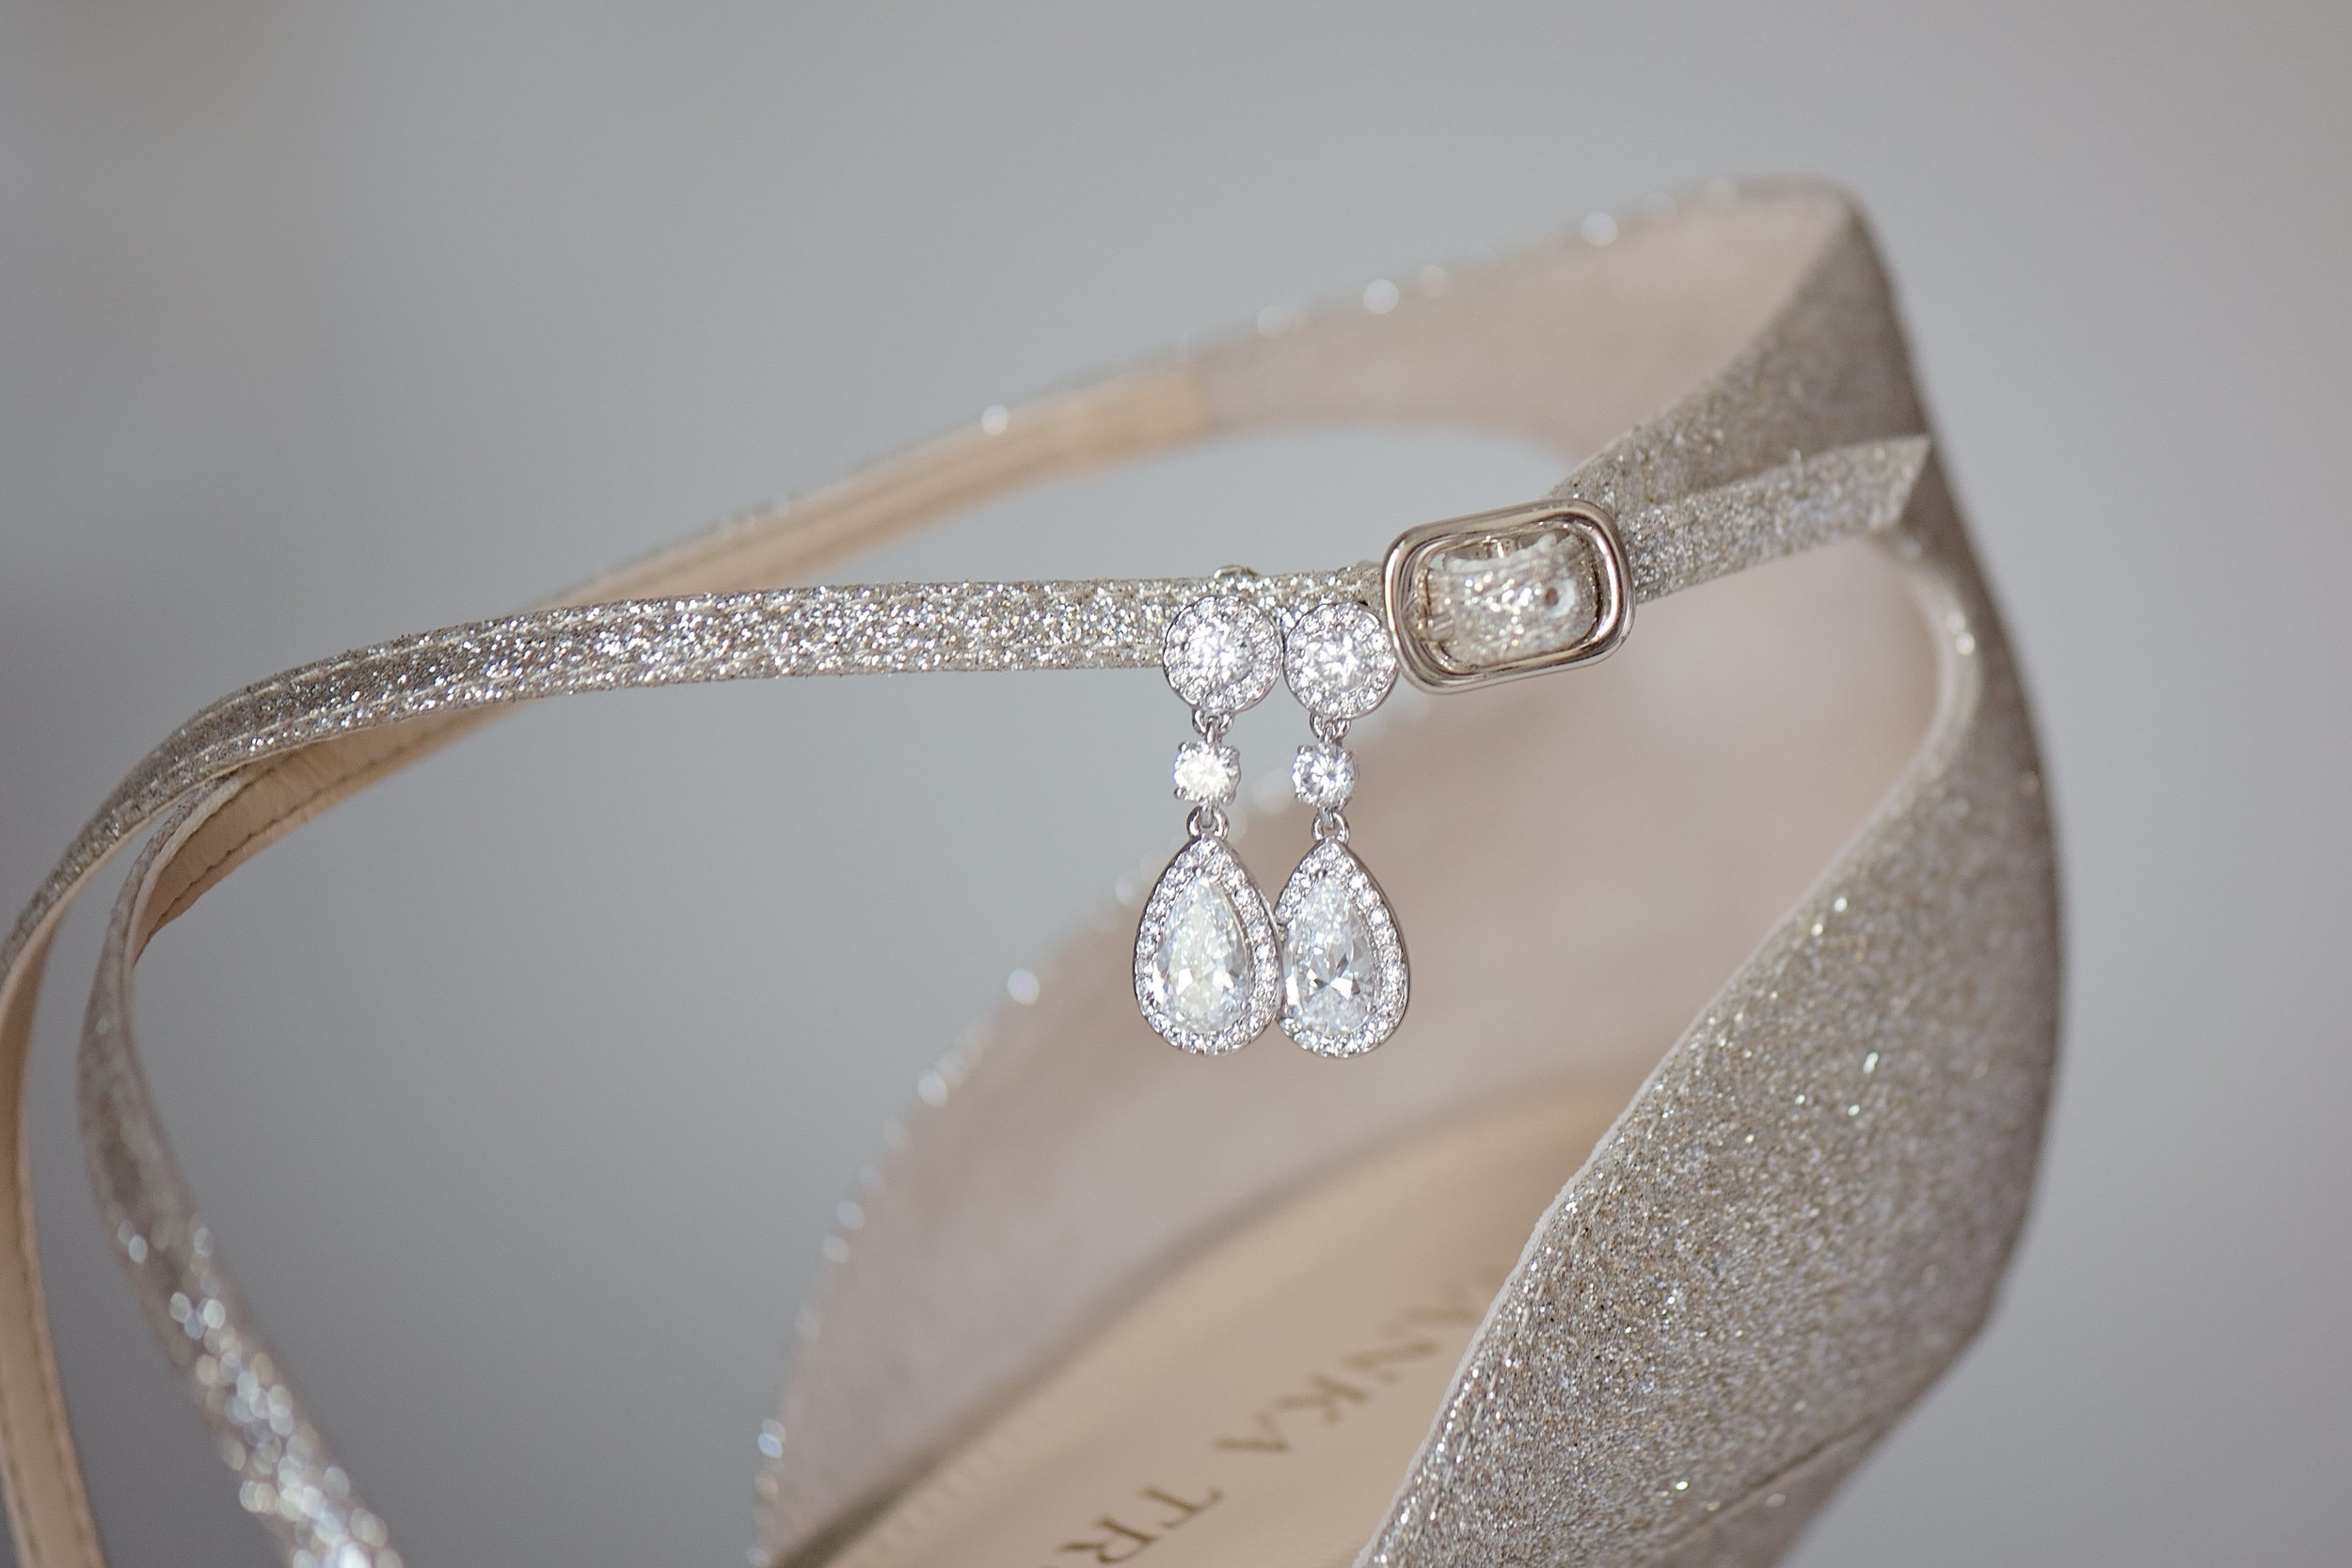 Champagne Wedding Shoes - Blush and White Wedding - Los Feliz Wedding